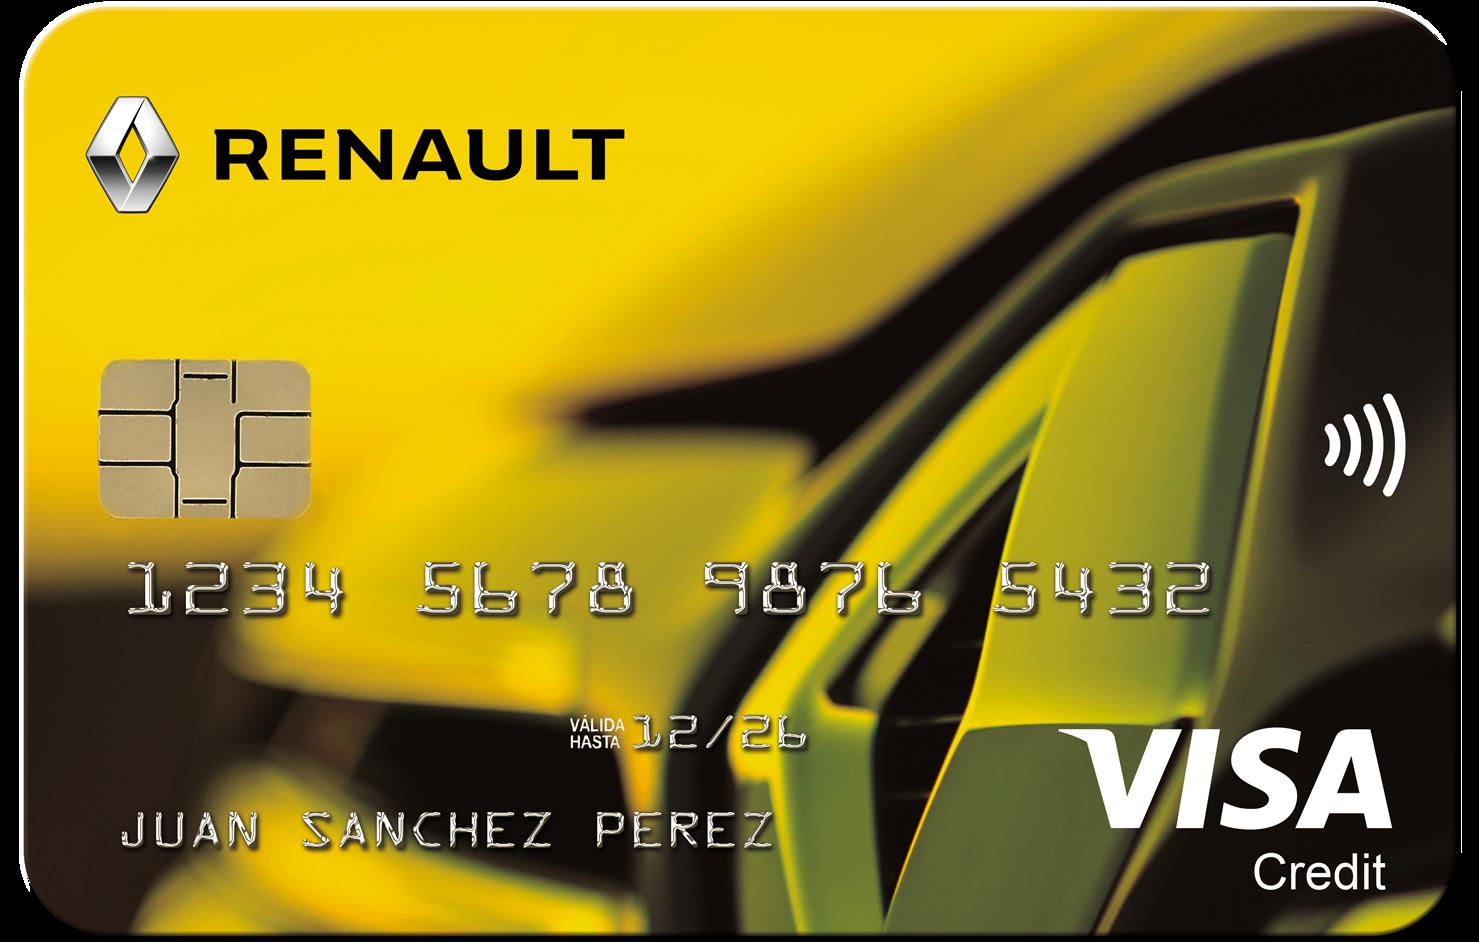 Tarjeta Renault Bankinter